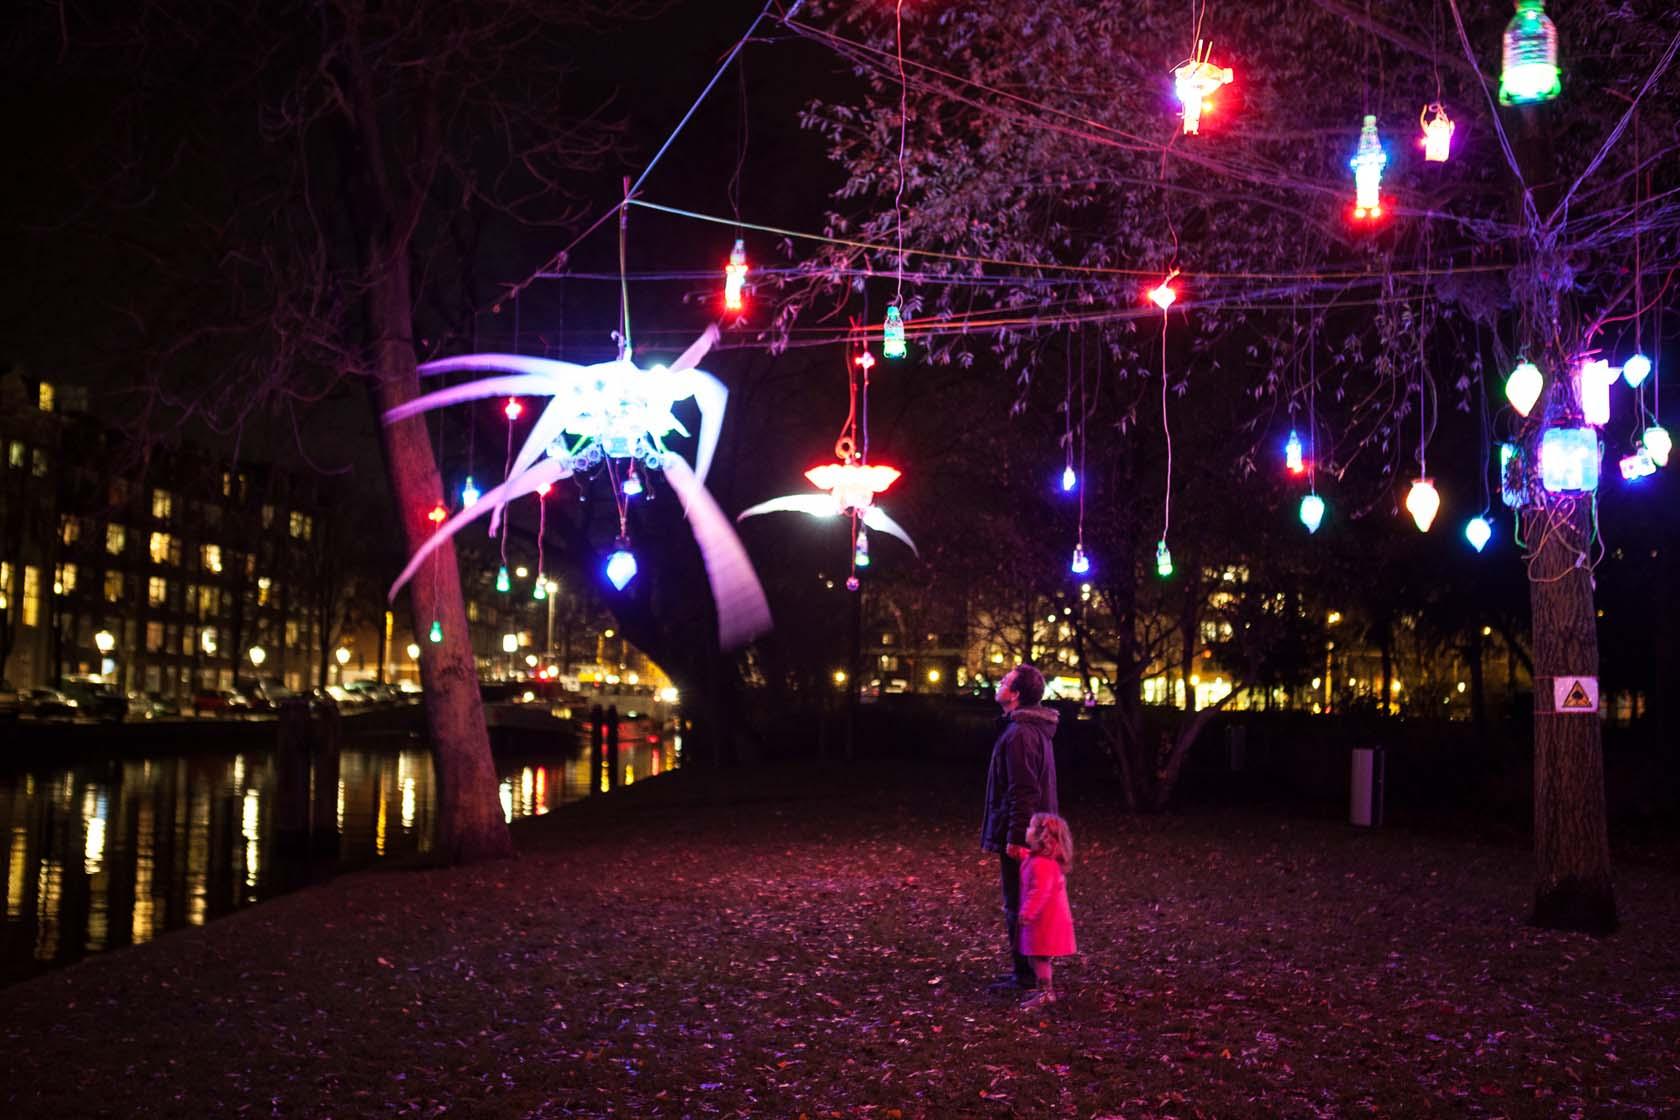 Amsterdam-Light-Festival-Stichting-Amsterdam-Light-Festival-Amsterdam-2013-Janus-van-den-Eijnden-15